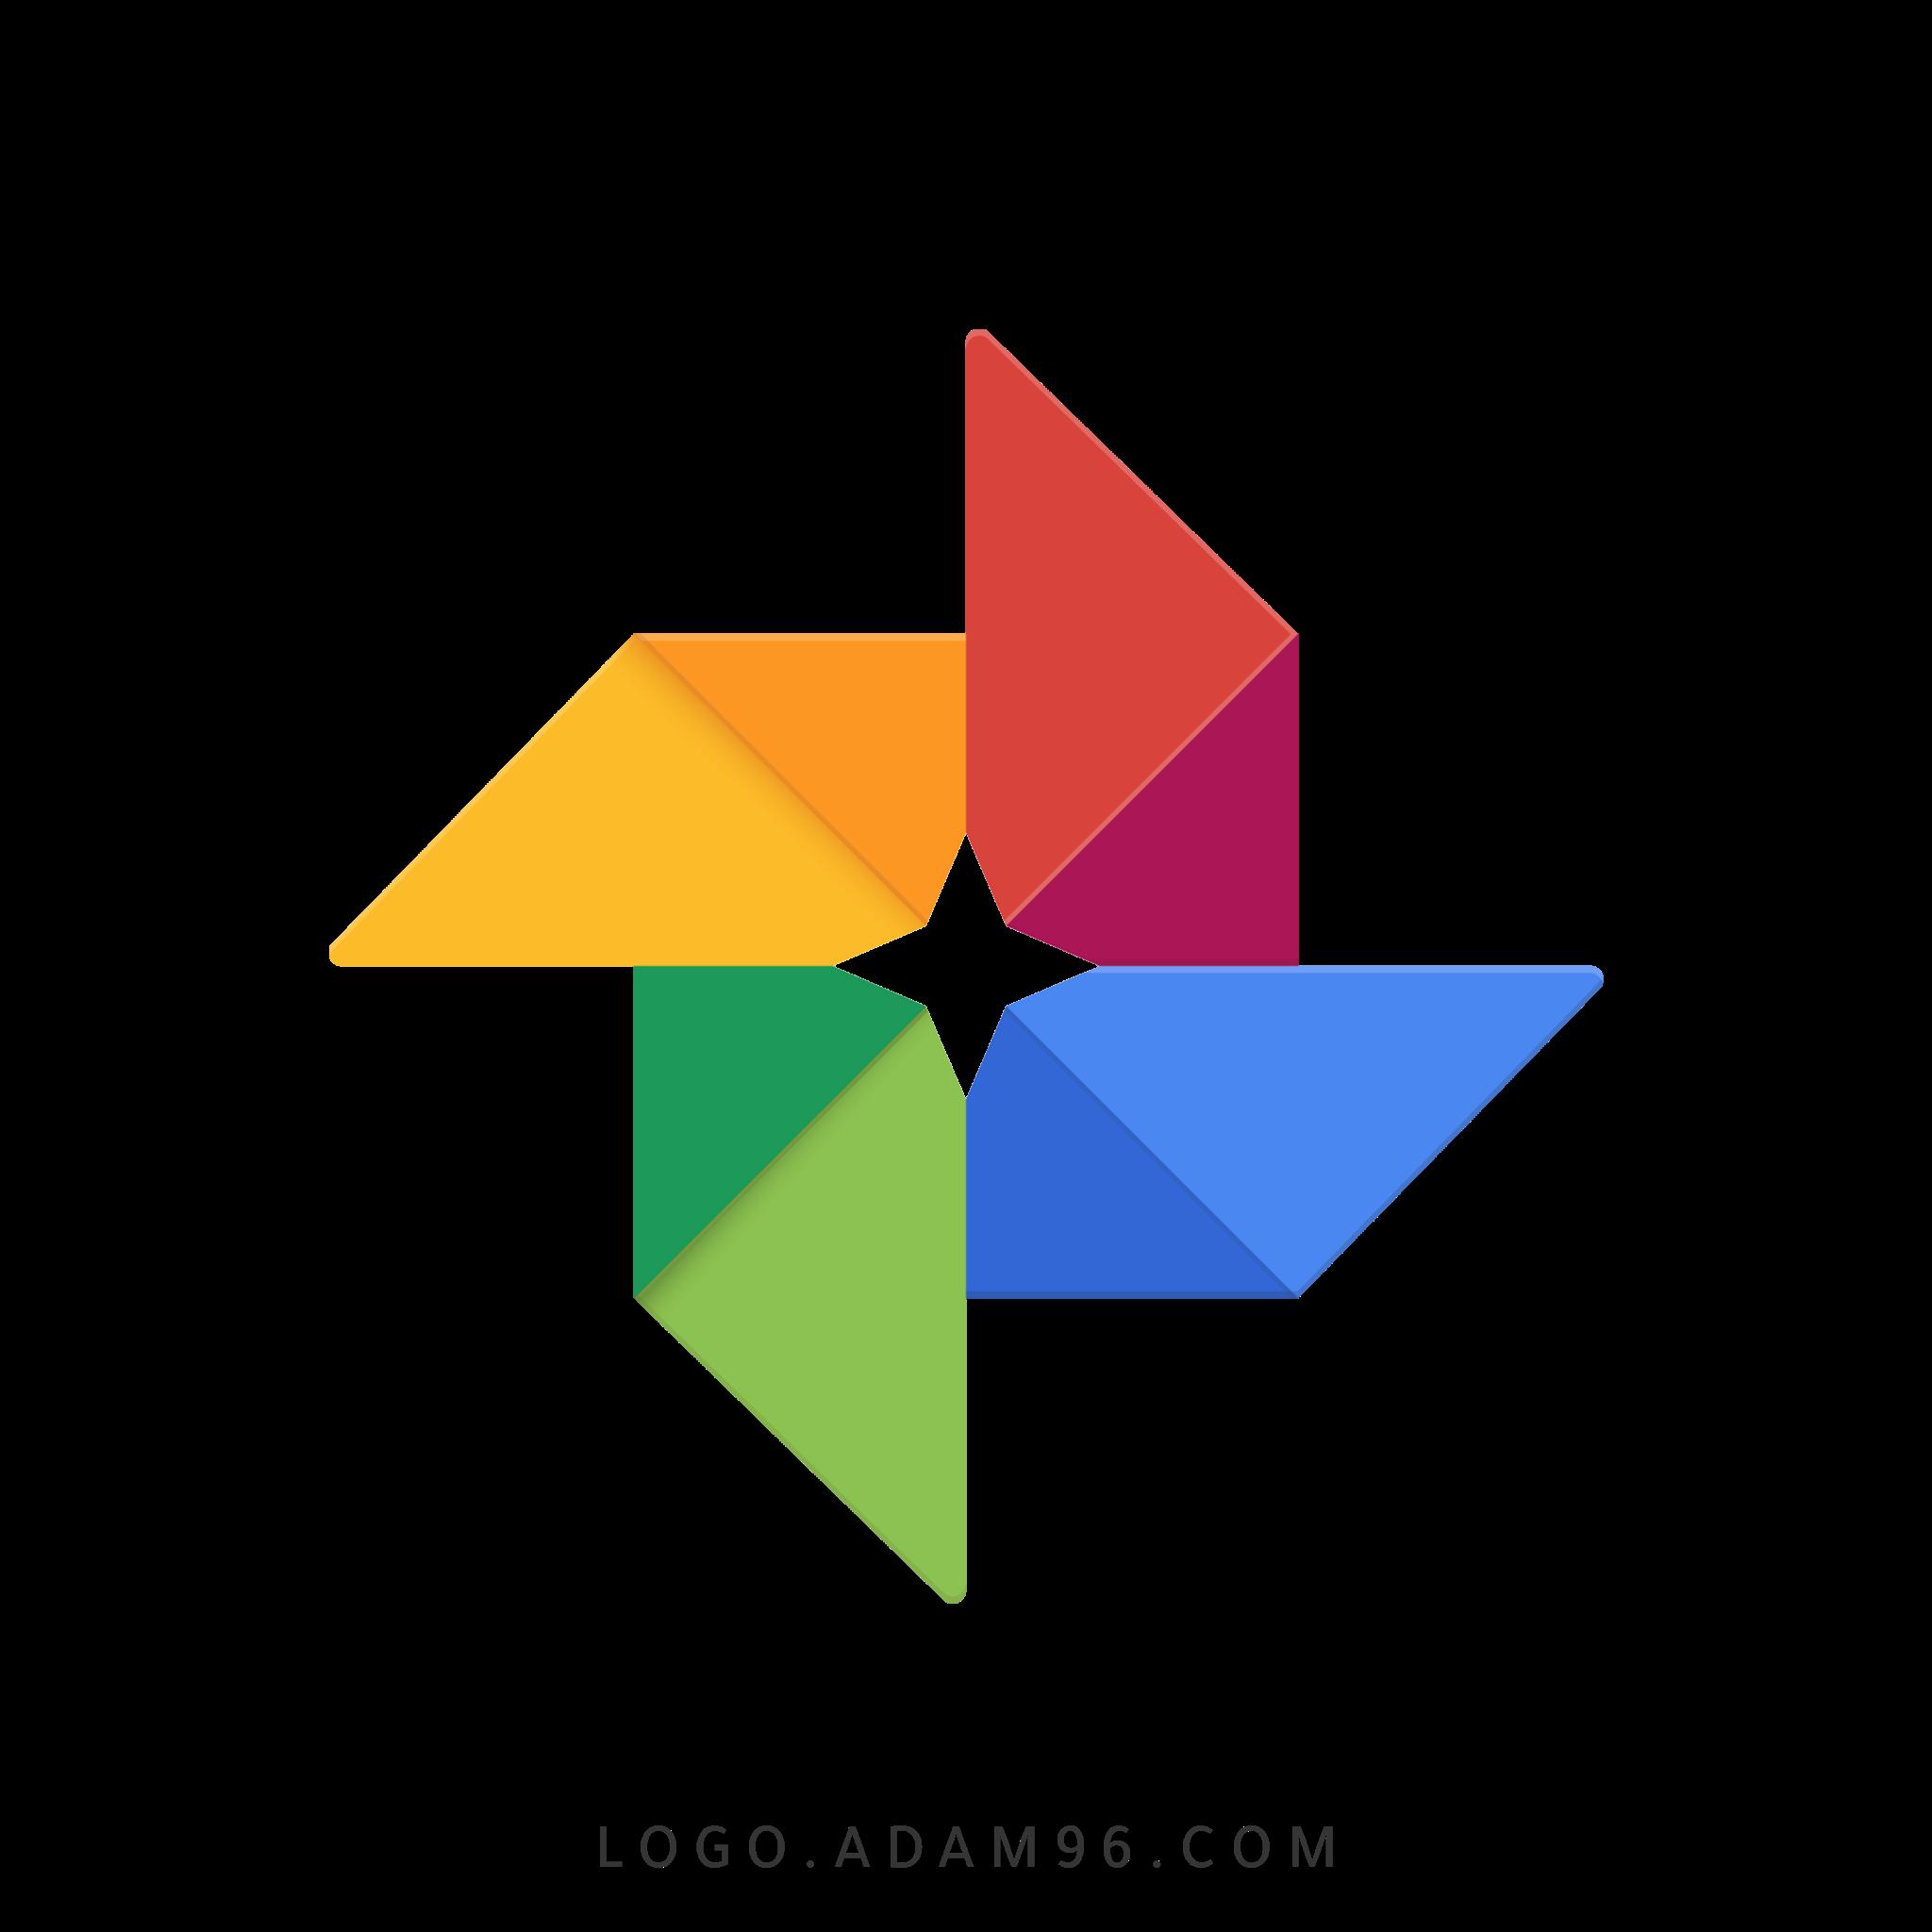 تحميل شعار جوجل صور الرسمي لوجو عالي الجودة Logo GOOGLE PHOTOS PNG